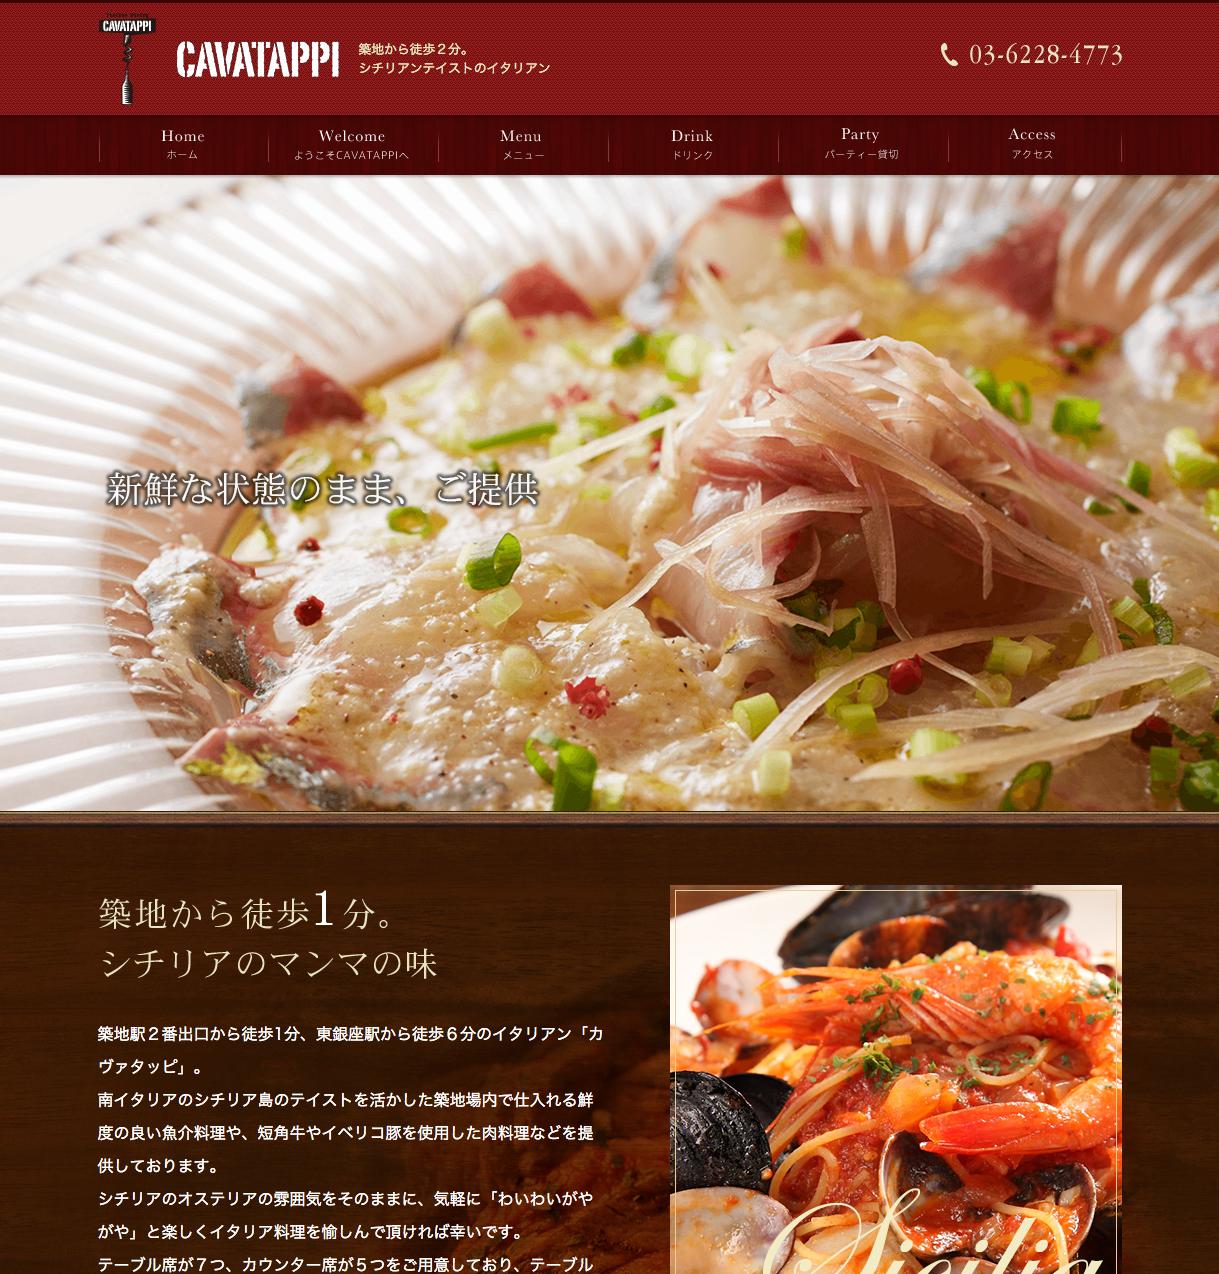 CAVATAPPI---Just-another-WordPress-site